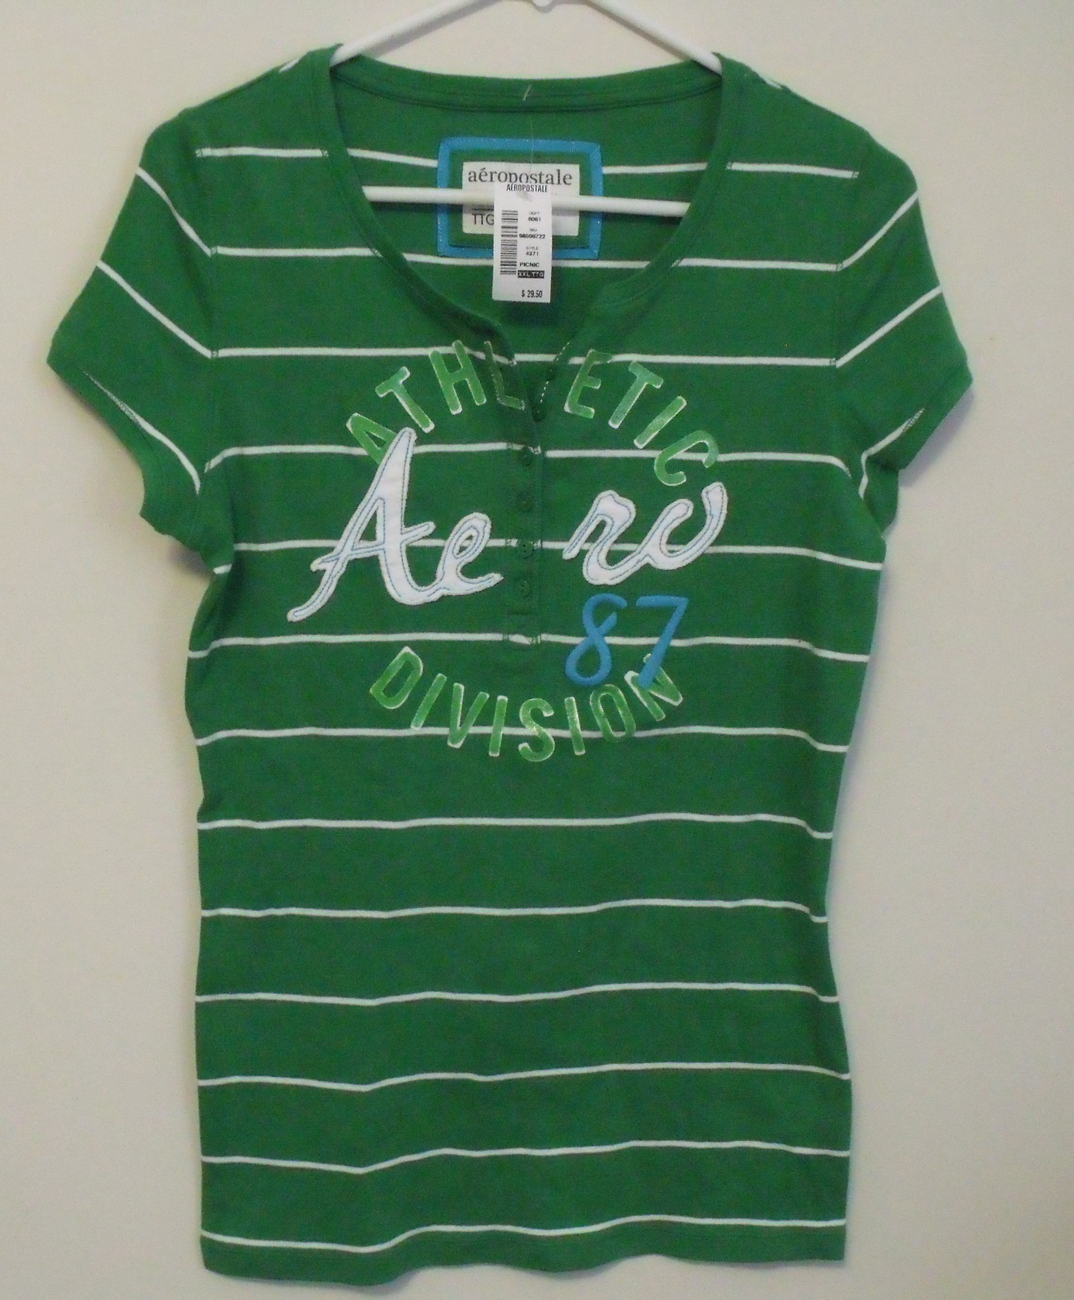 Aero tshirt green front